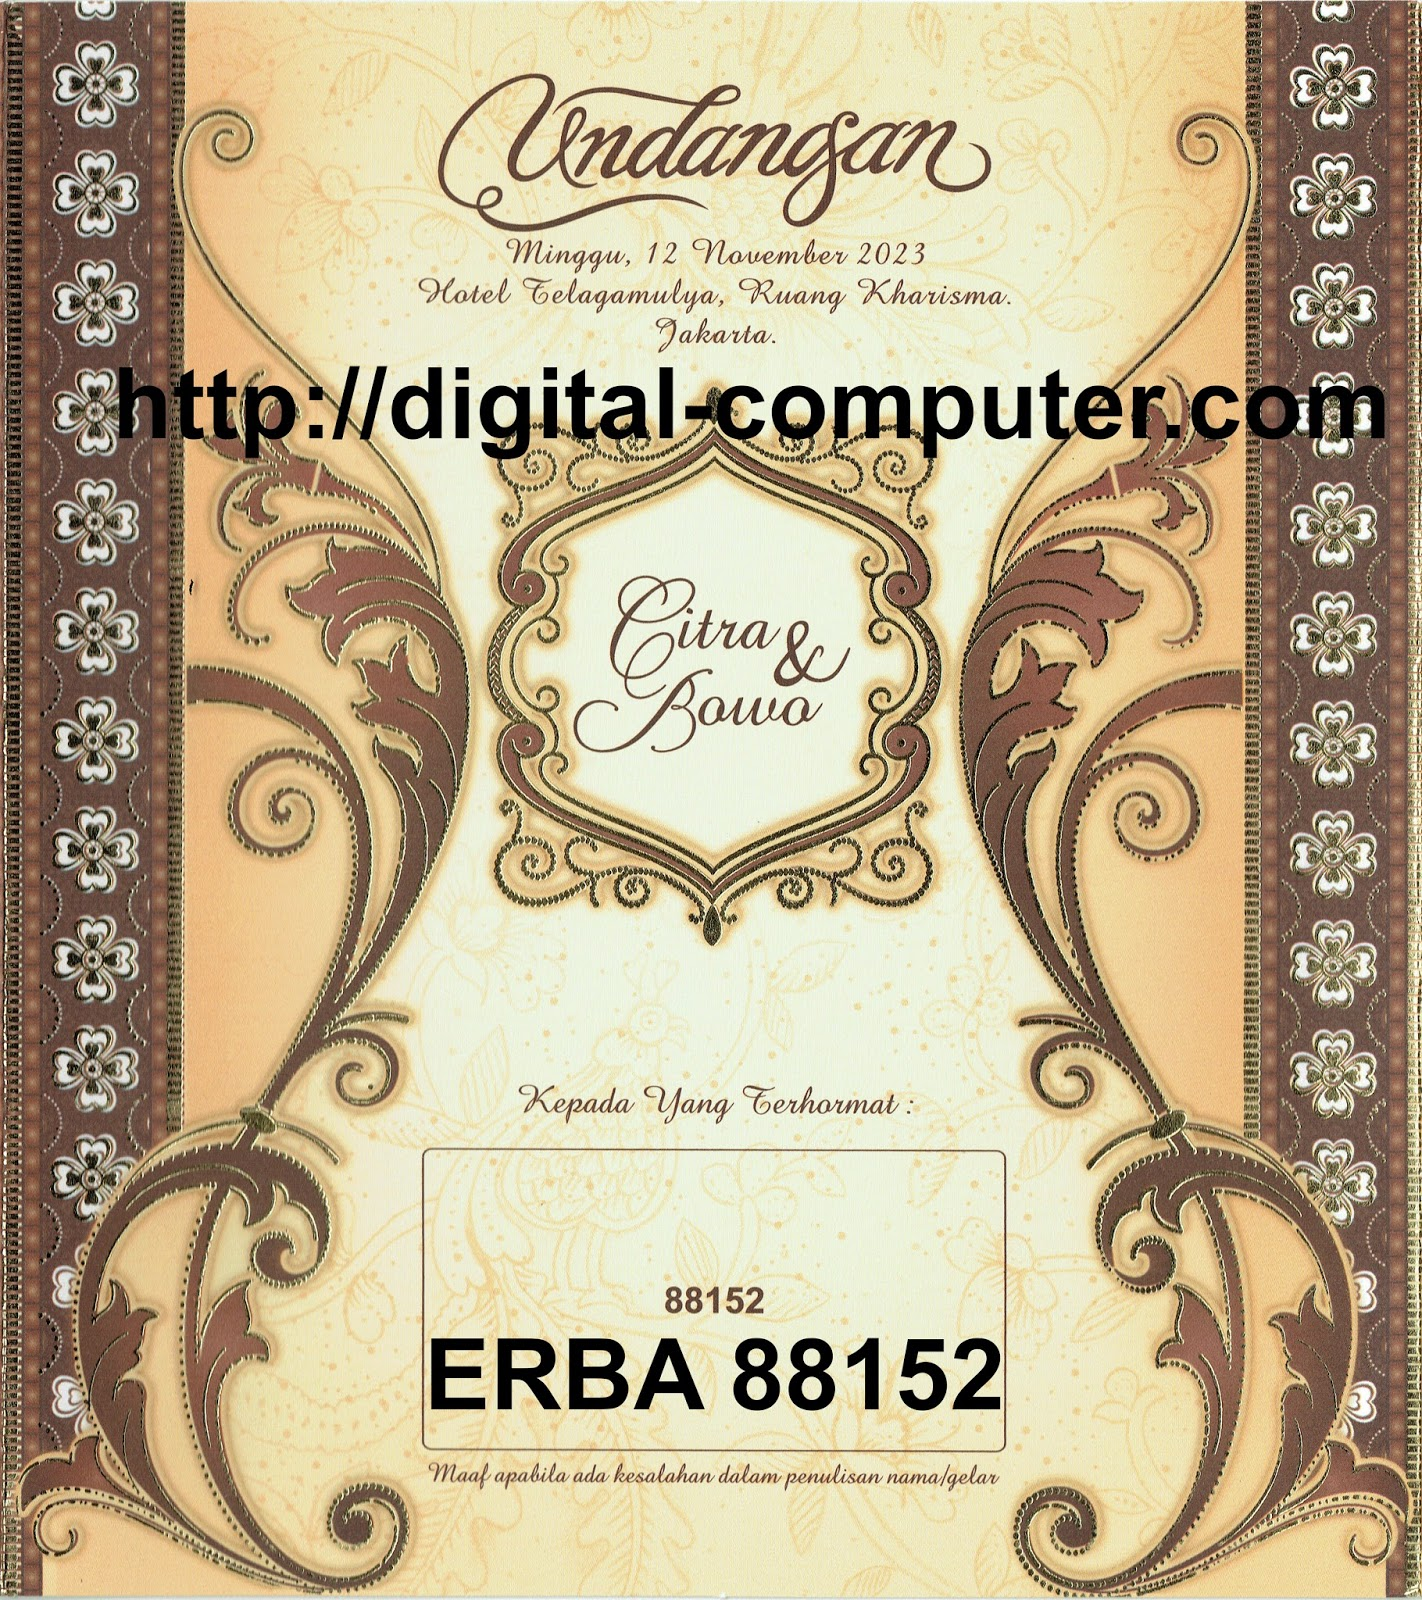 Undangan Softcover ERBA 88152